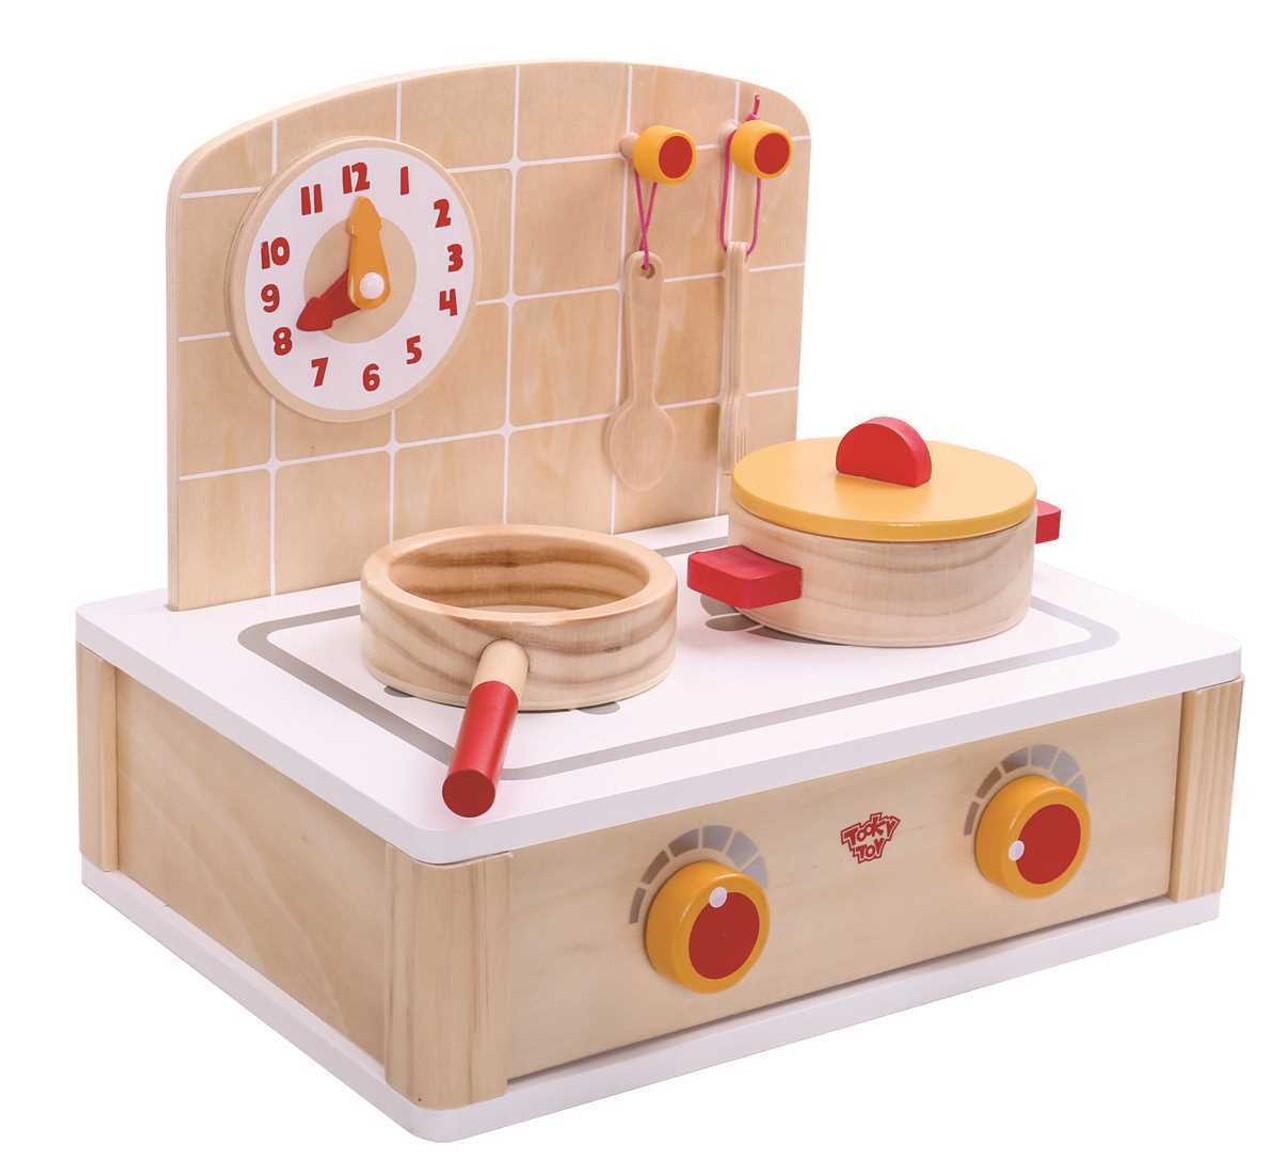 Eleganter - Tooky Toy Wooden Cute Kitchen Set Pretend Play